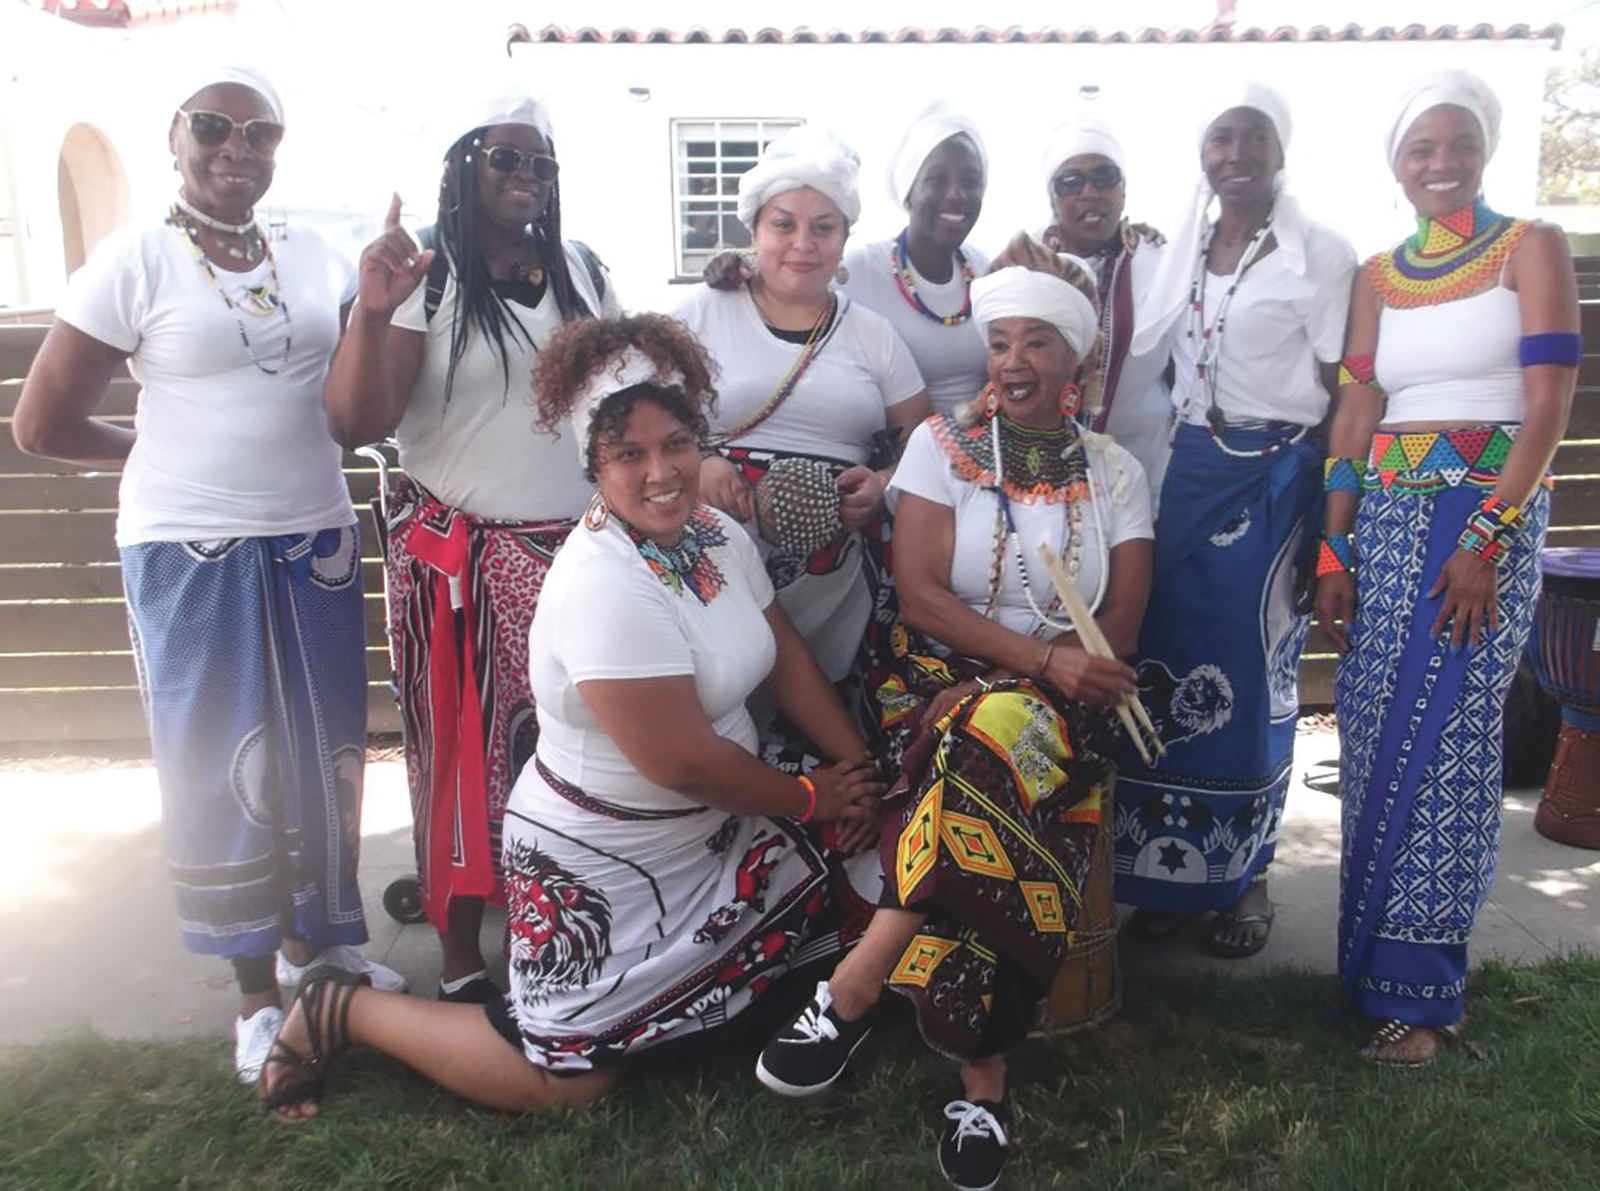 S.H.I.N.E. Mawusi Women's African Drum Group. (Courtesy Photo)